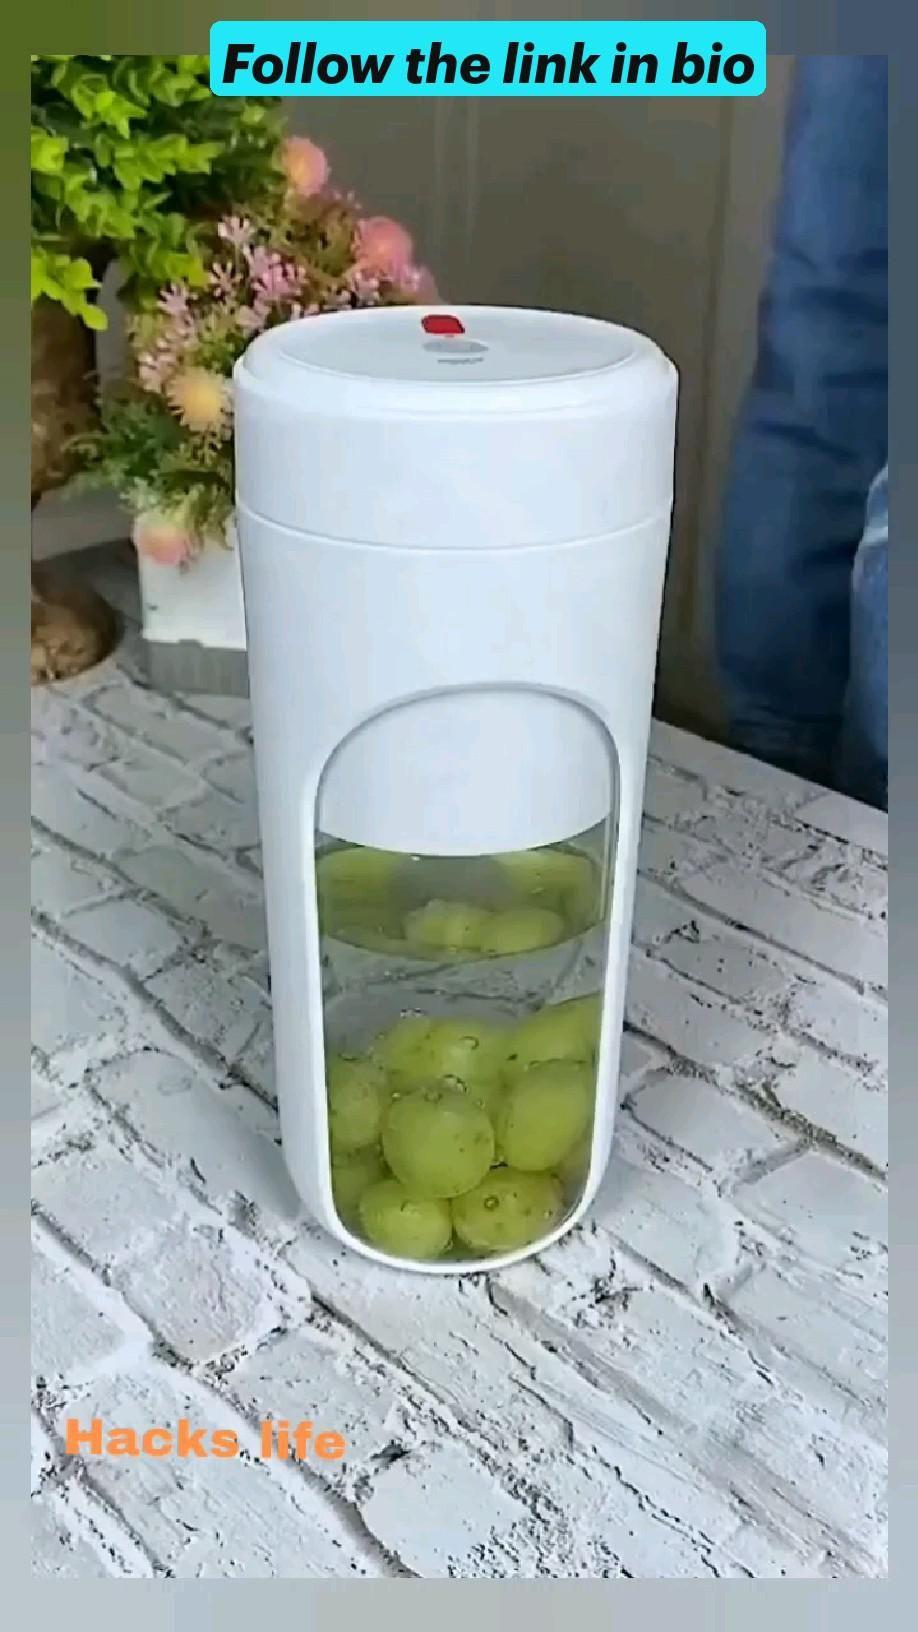 Juice blender  New gadgets Smart gadgets Kitchen accessories  kitchen items